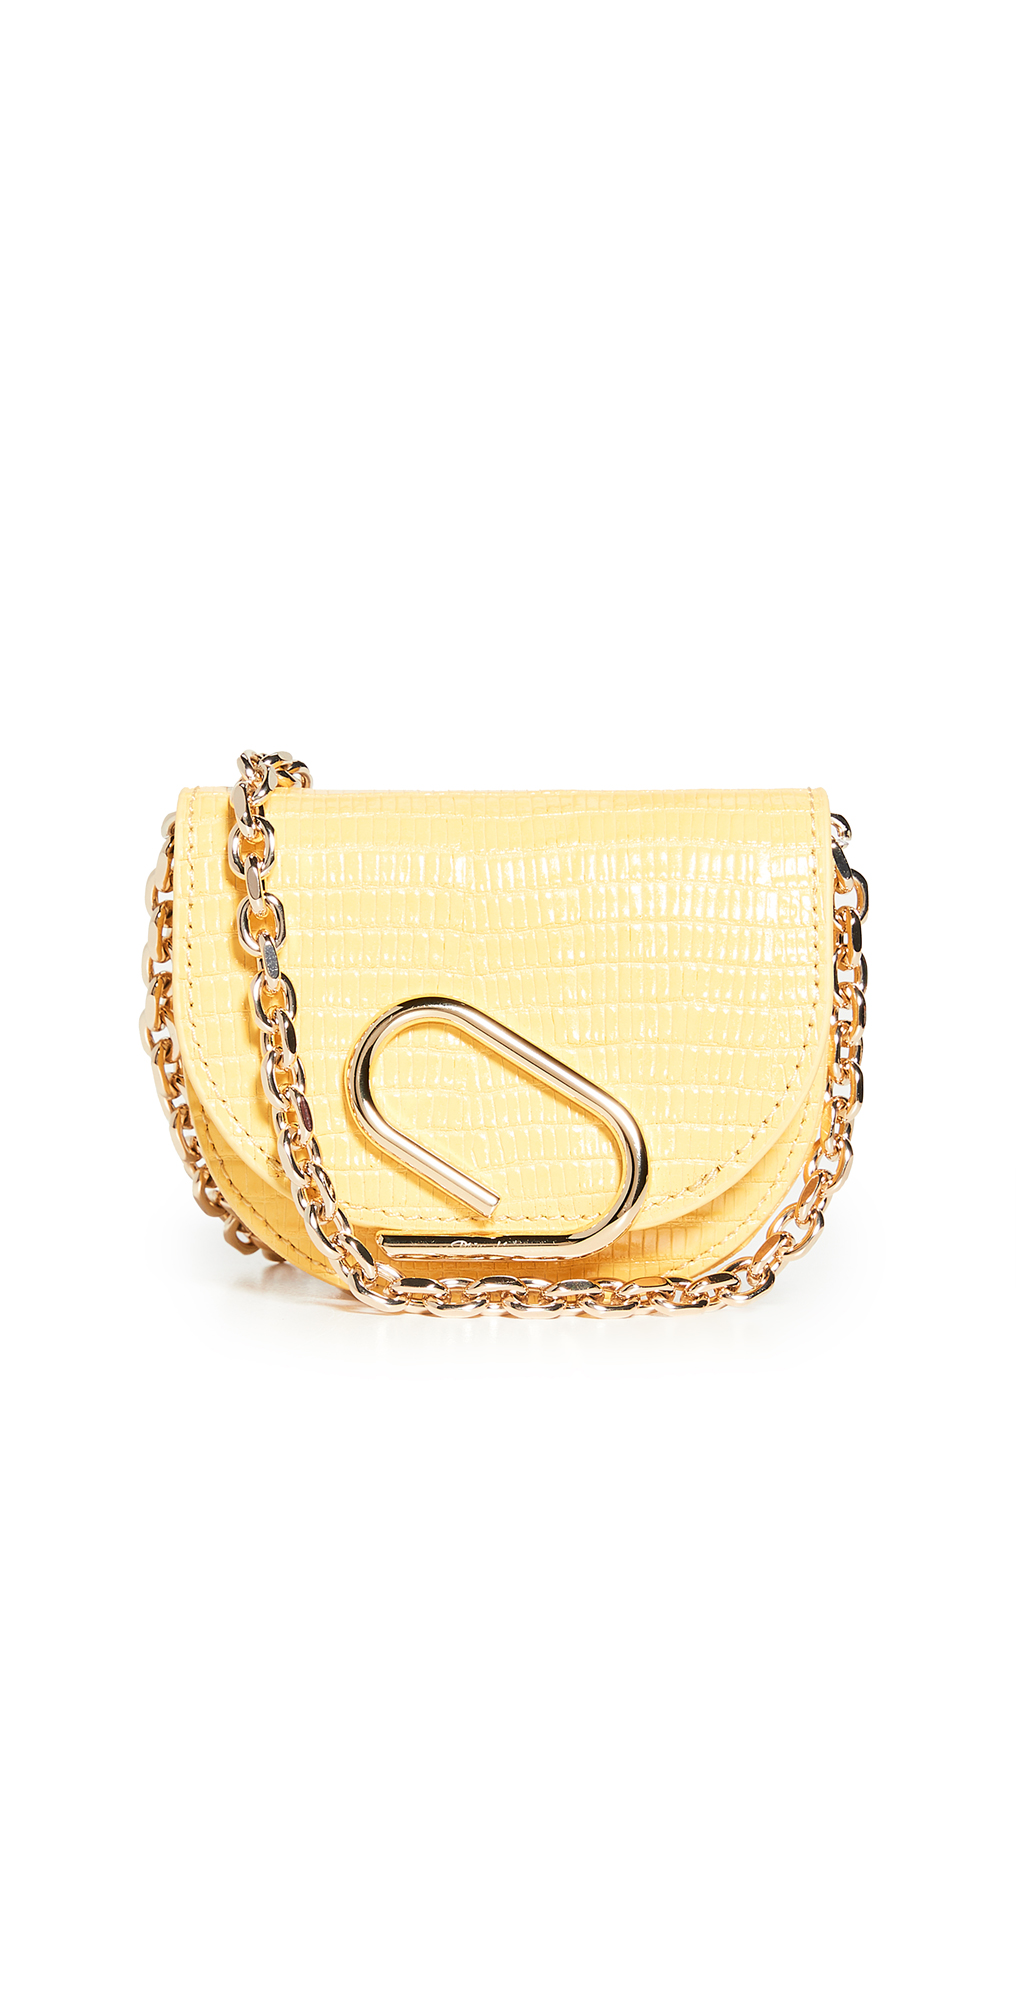 3.1 Phillip Lim Alix Mini Cardcase On Chain Bag